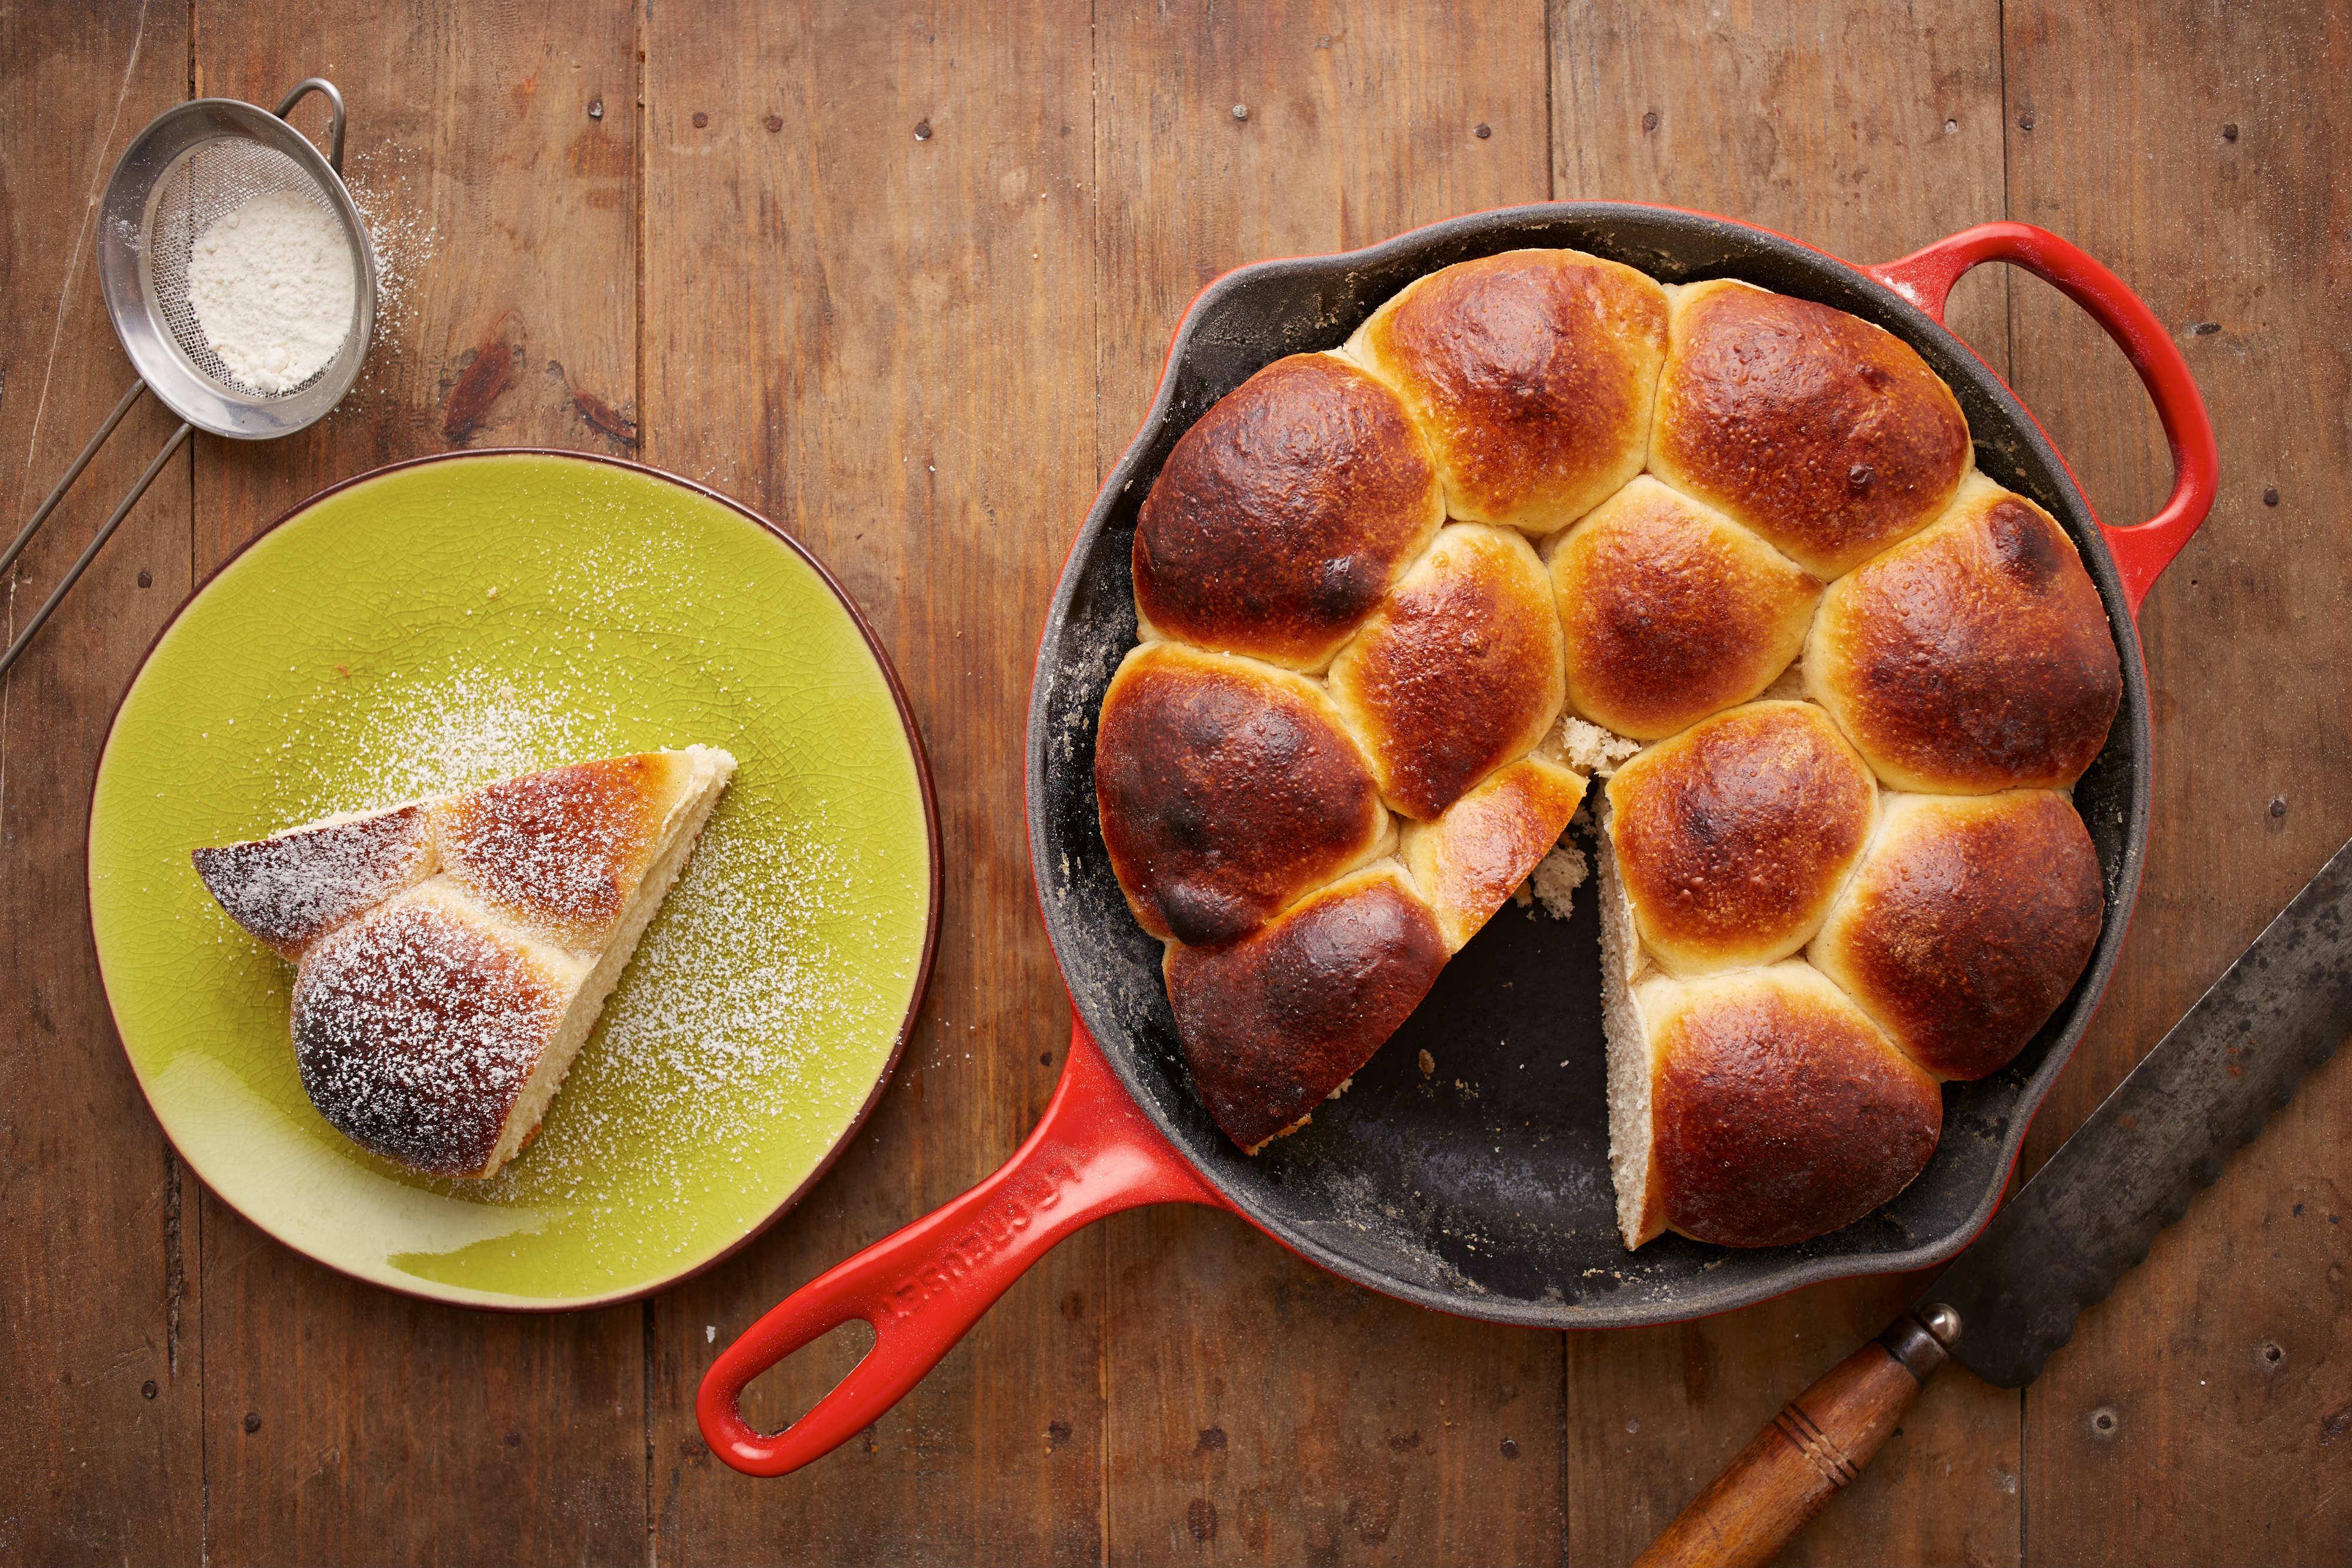 ricetta pan brioche dolce soffice